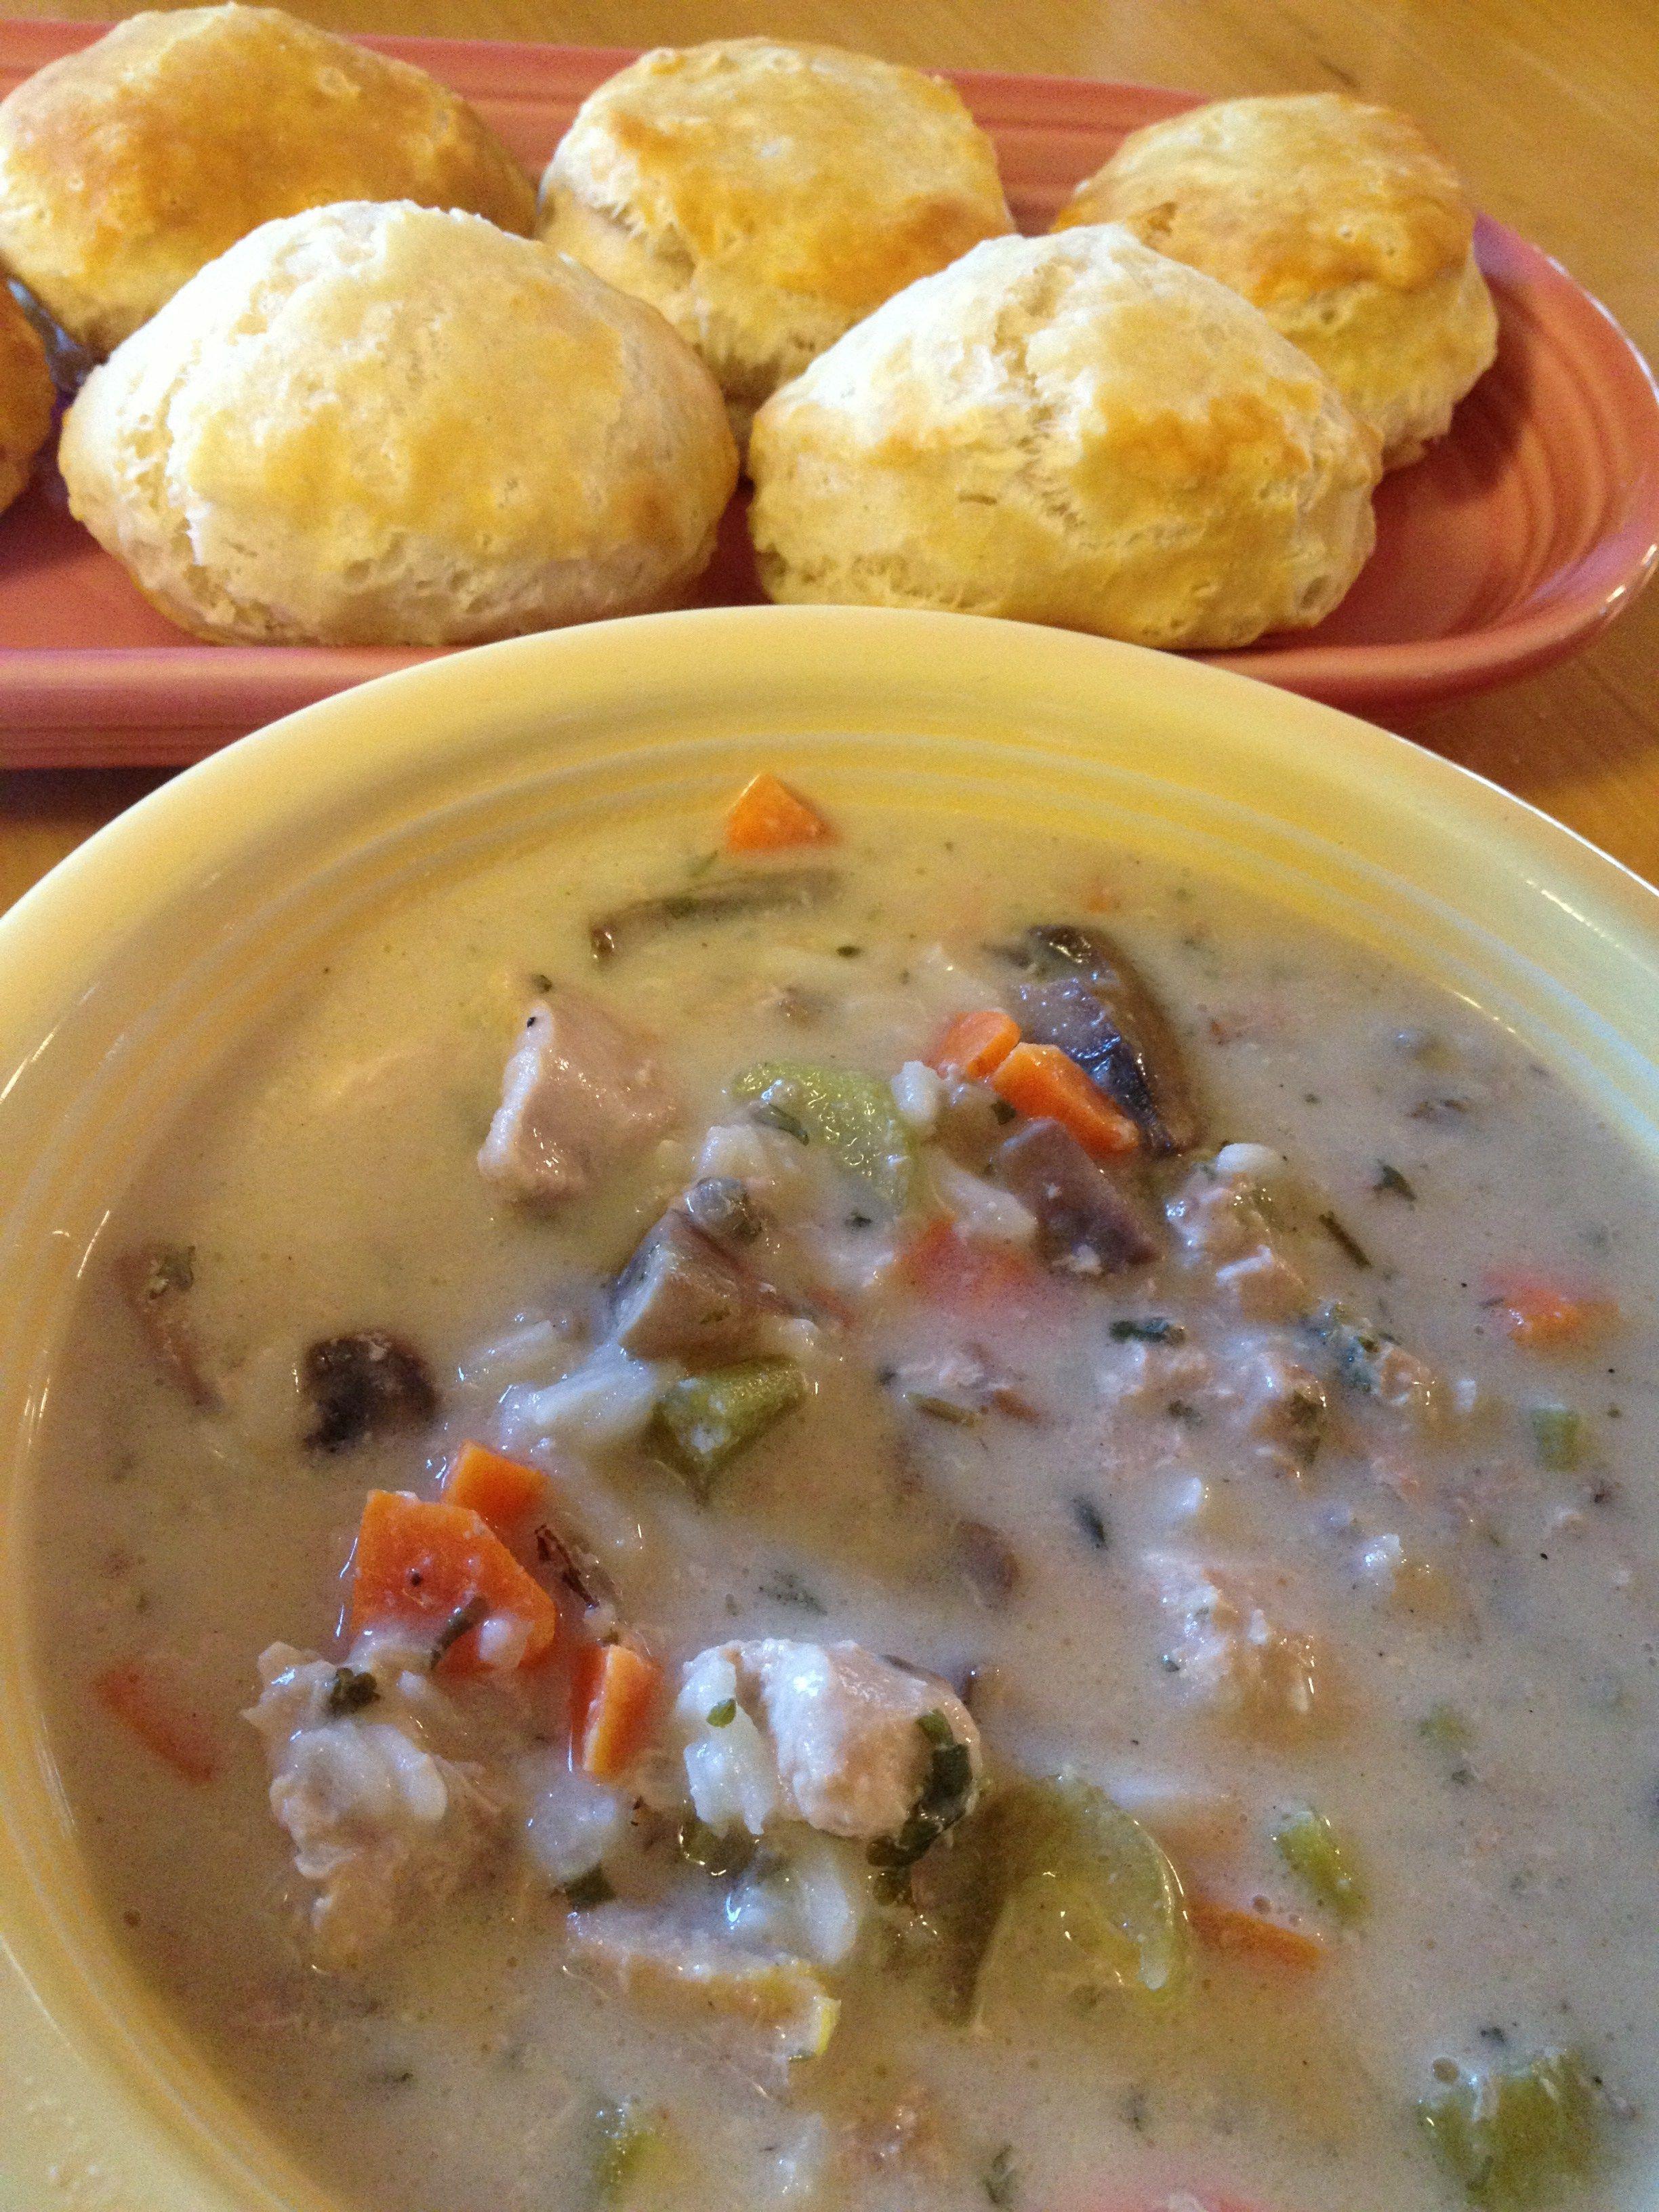 Crockpot Creamy Pheasant Wild Rice Soup Recipe Pheasant Recipes Wild Rice Soup Game Food